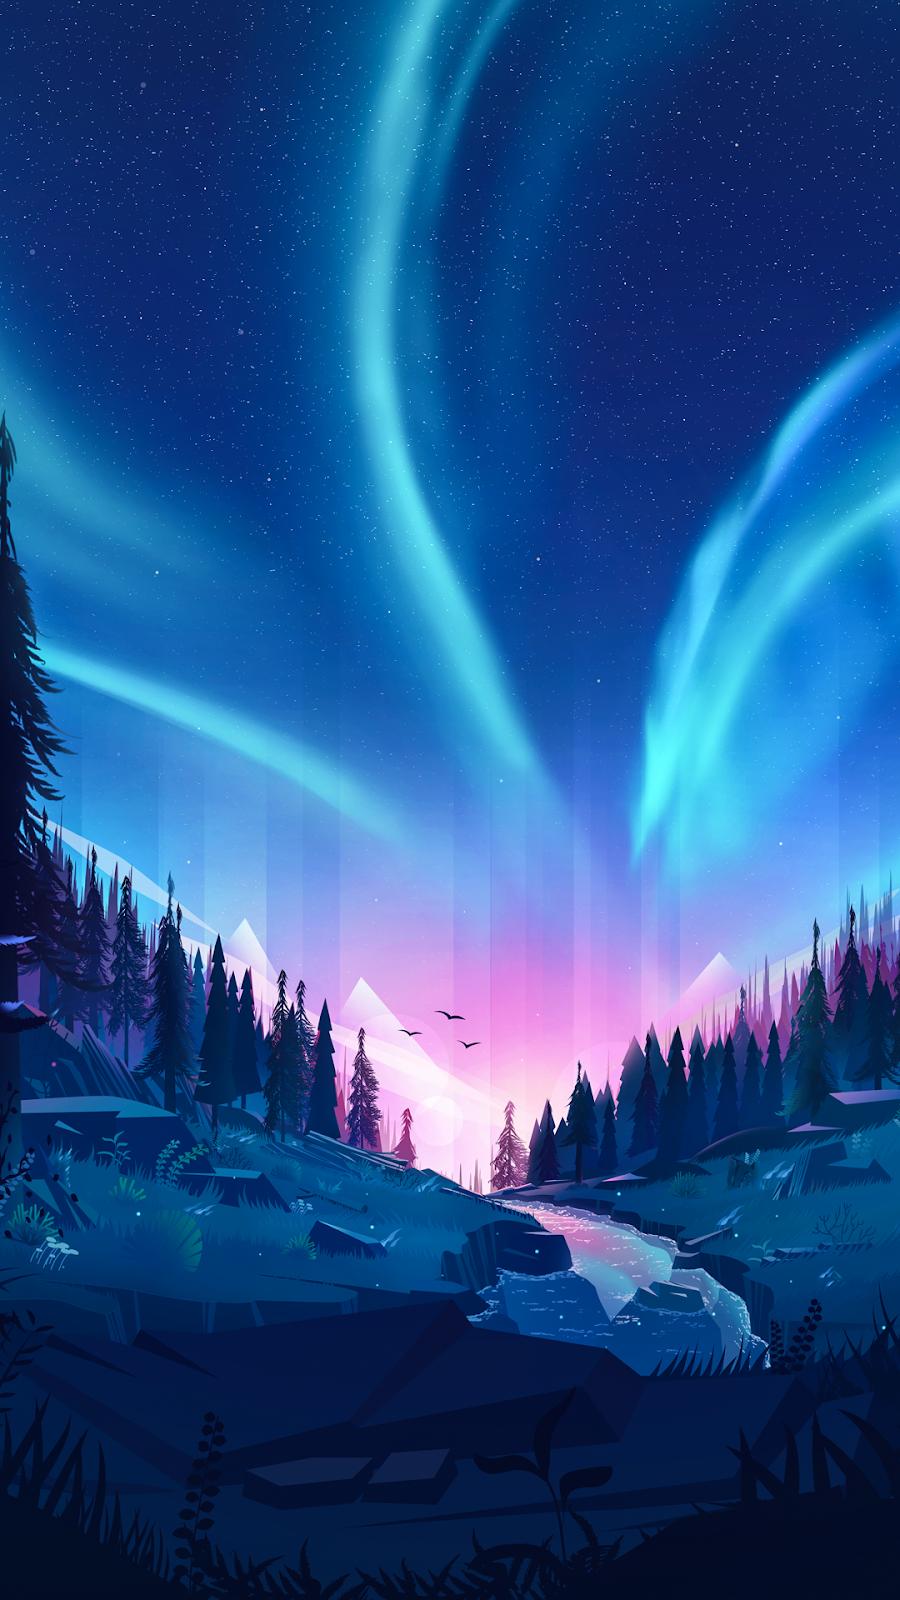 Auroral forest by sakurachen beautiful wallpaper - Cool night nature backgrounds ...